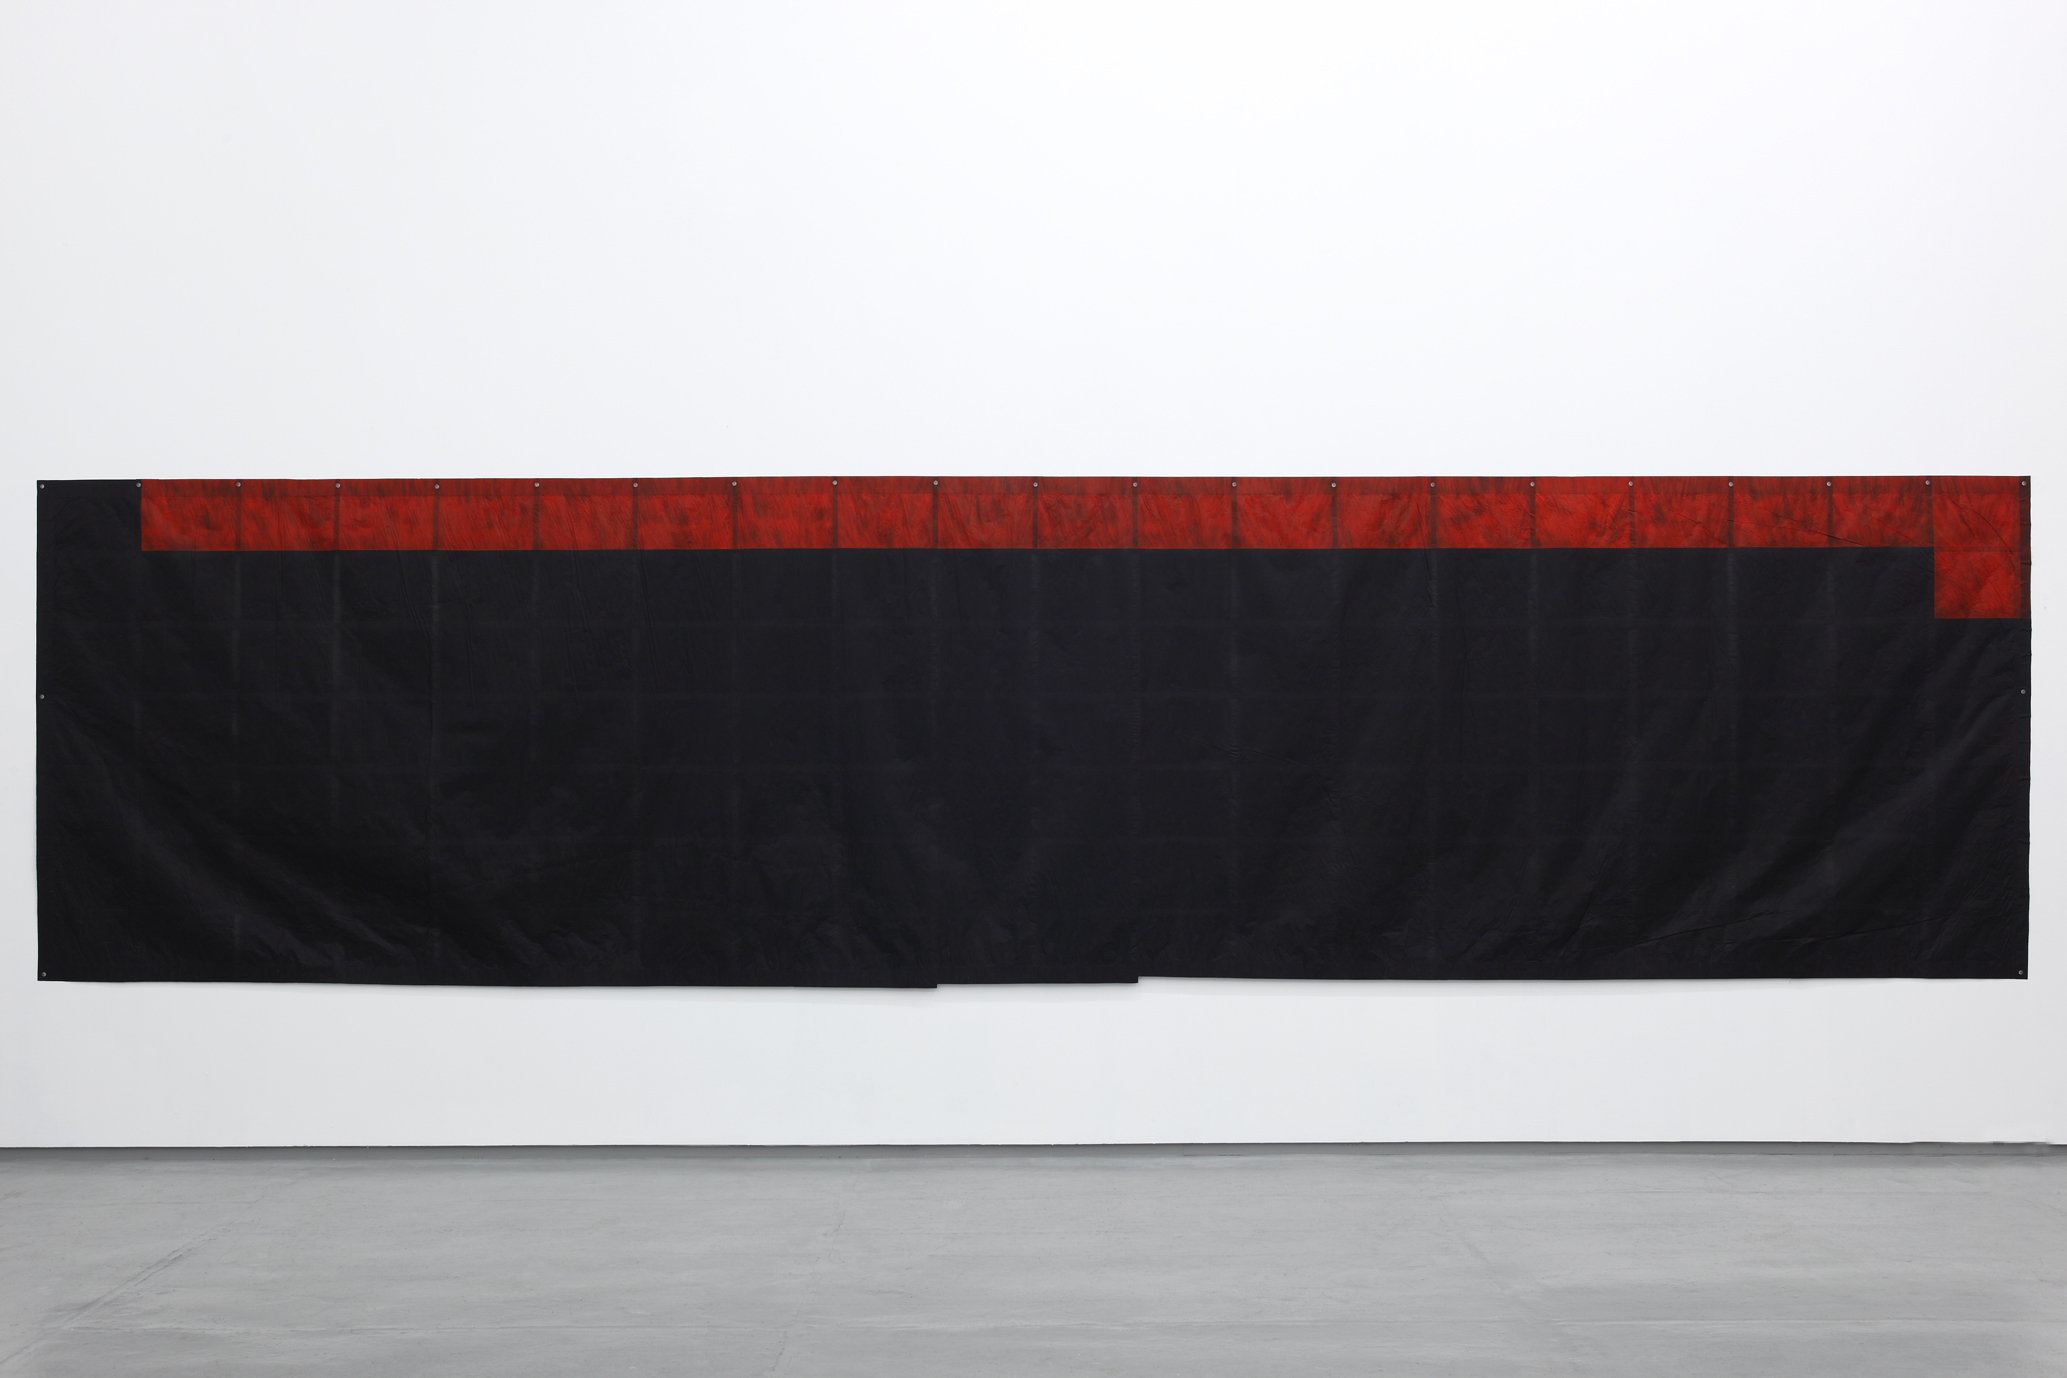 State of Gathering , 1977 集状 ( Shūjō ) Carbon paper 59 x 213 1/2 inches 151.5 x 592.5 cm